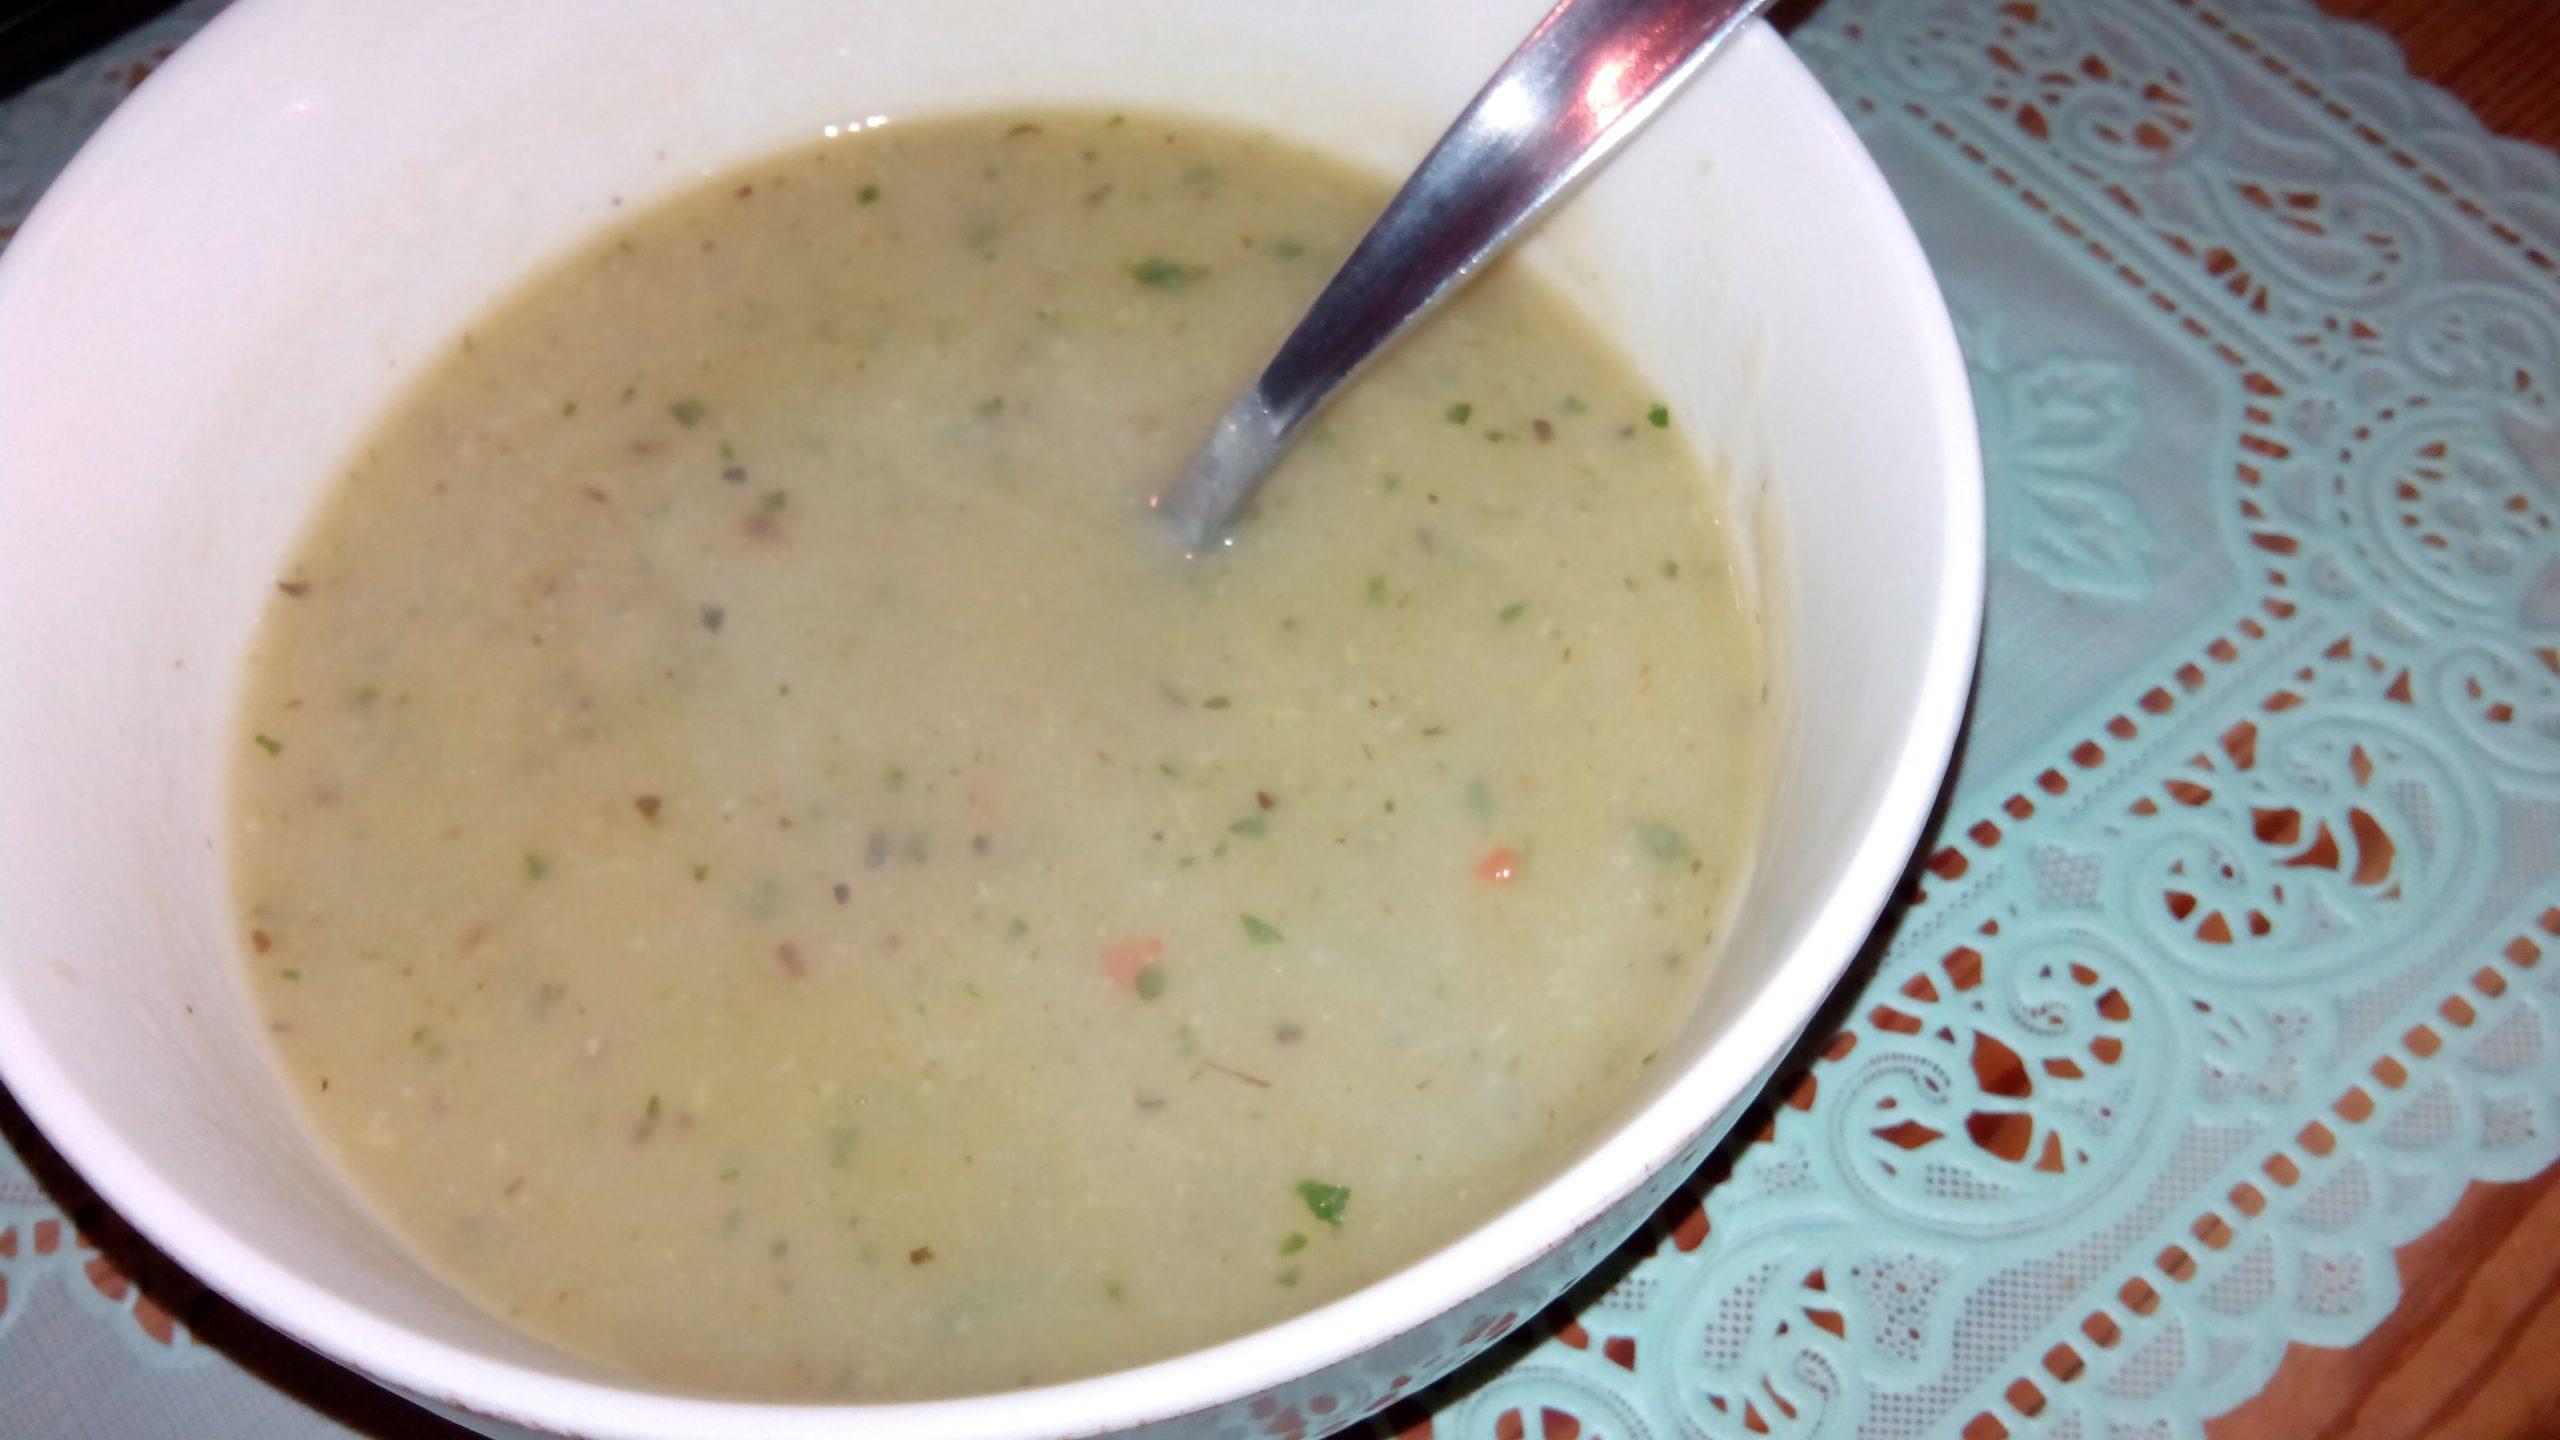 Courgette-venkel-basilicum soep met pastinaak